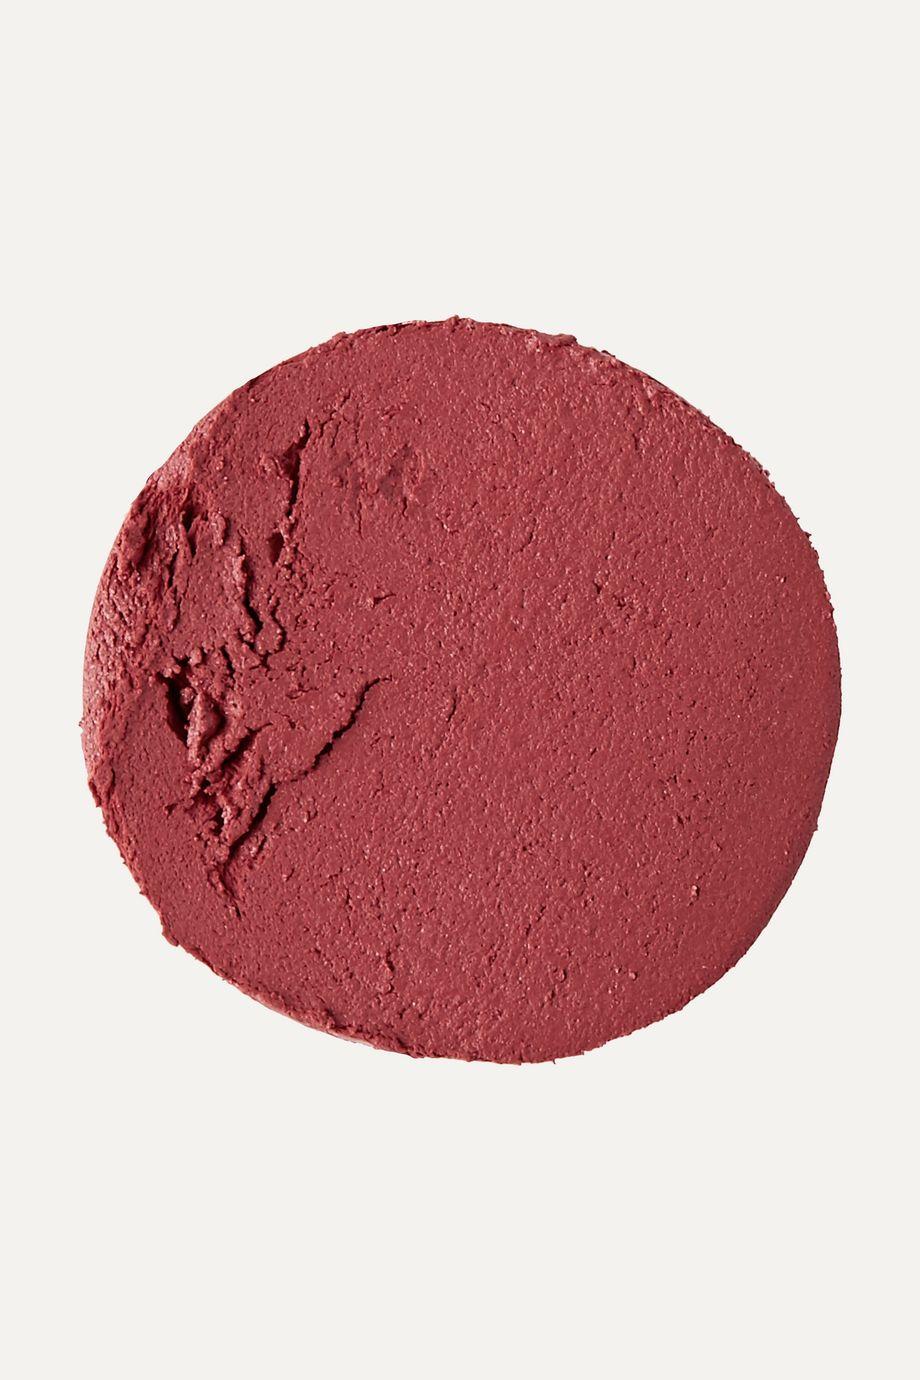 Illamasqua Antimatter Lipstick - Equinox